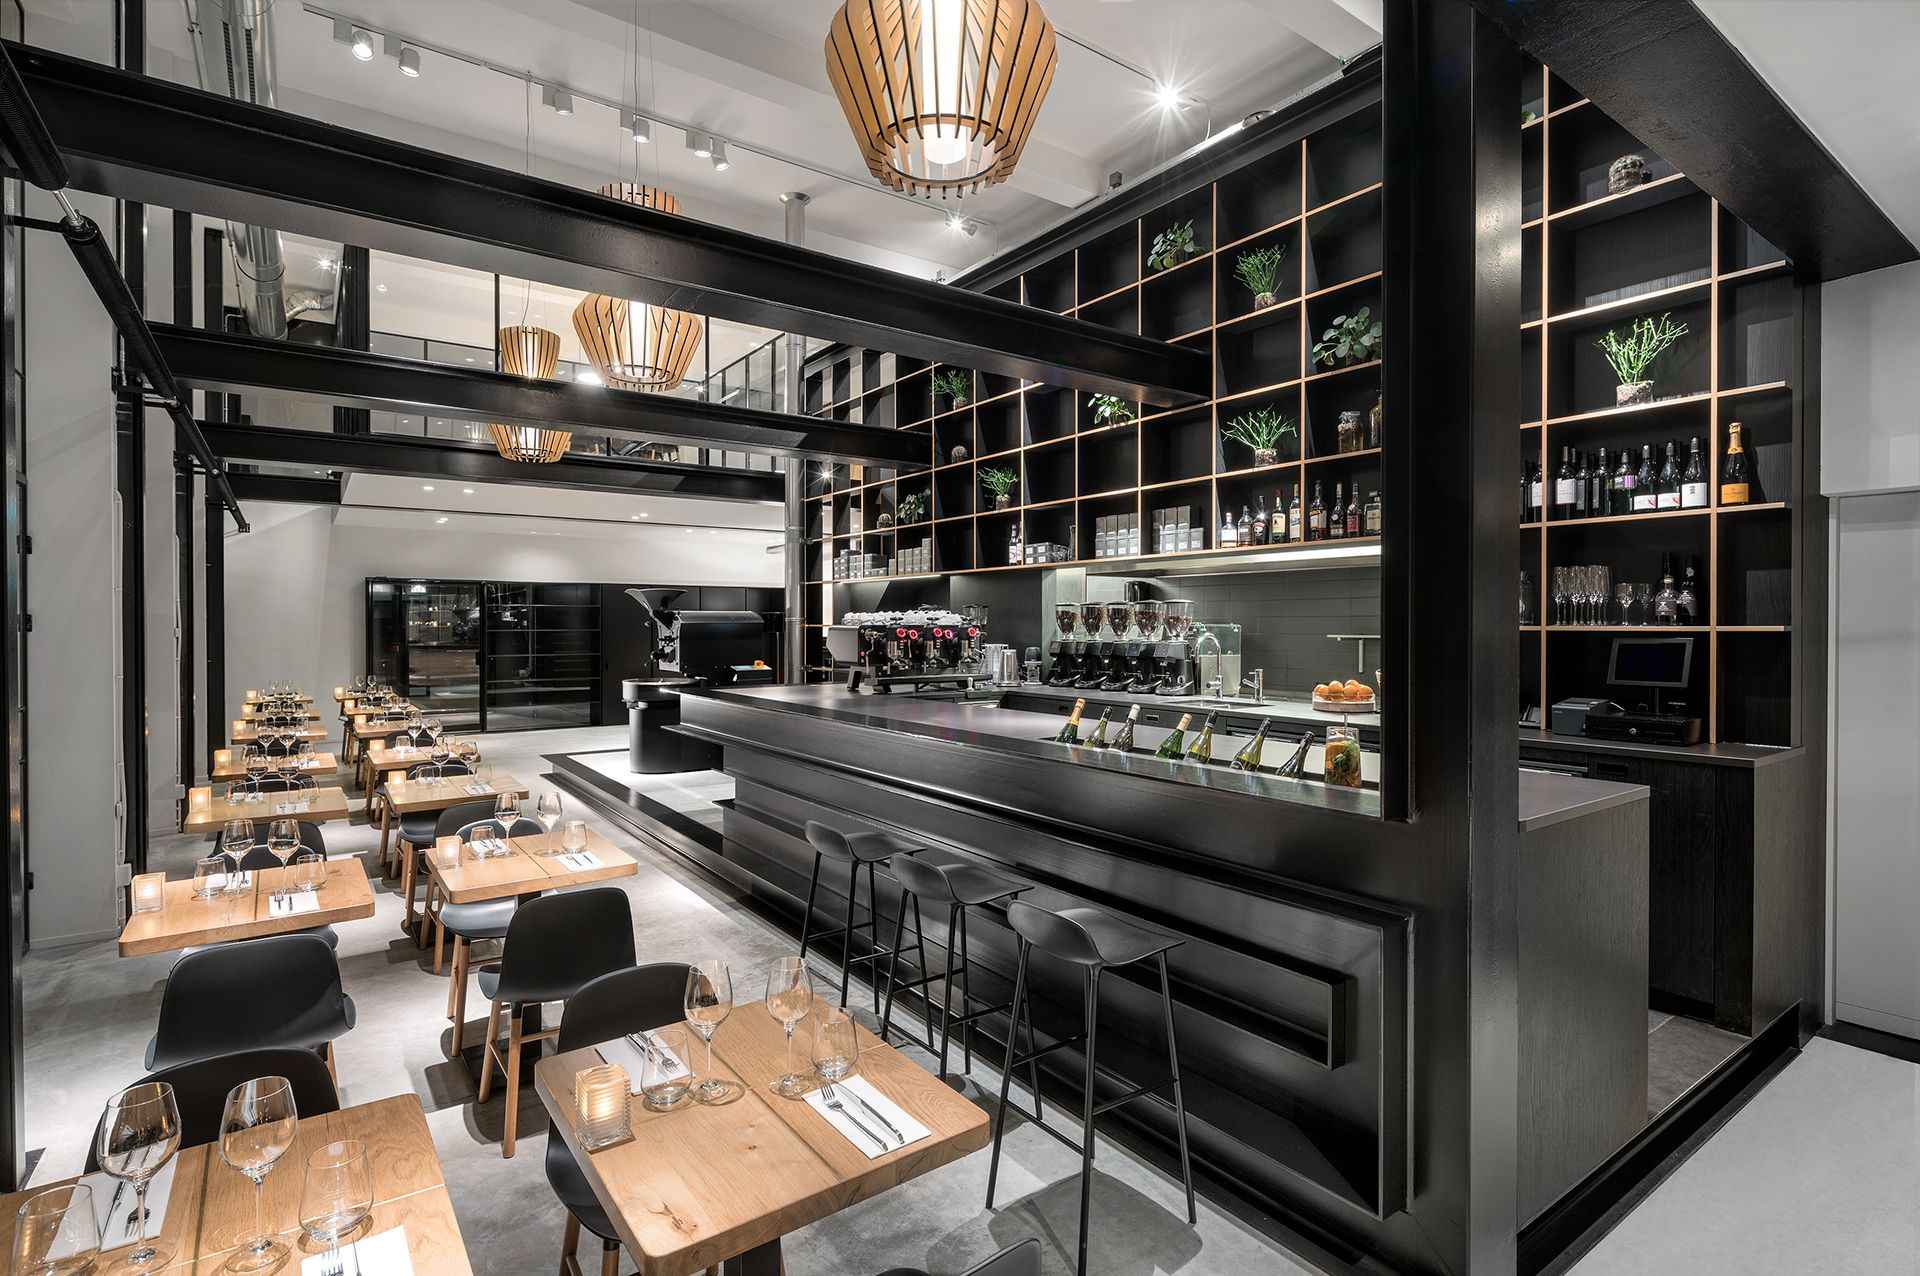 Arredamento Bistrot ~ Capriole cafè a laja #interiordesign #bar #industrial #inspiration